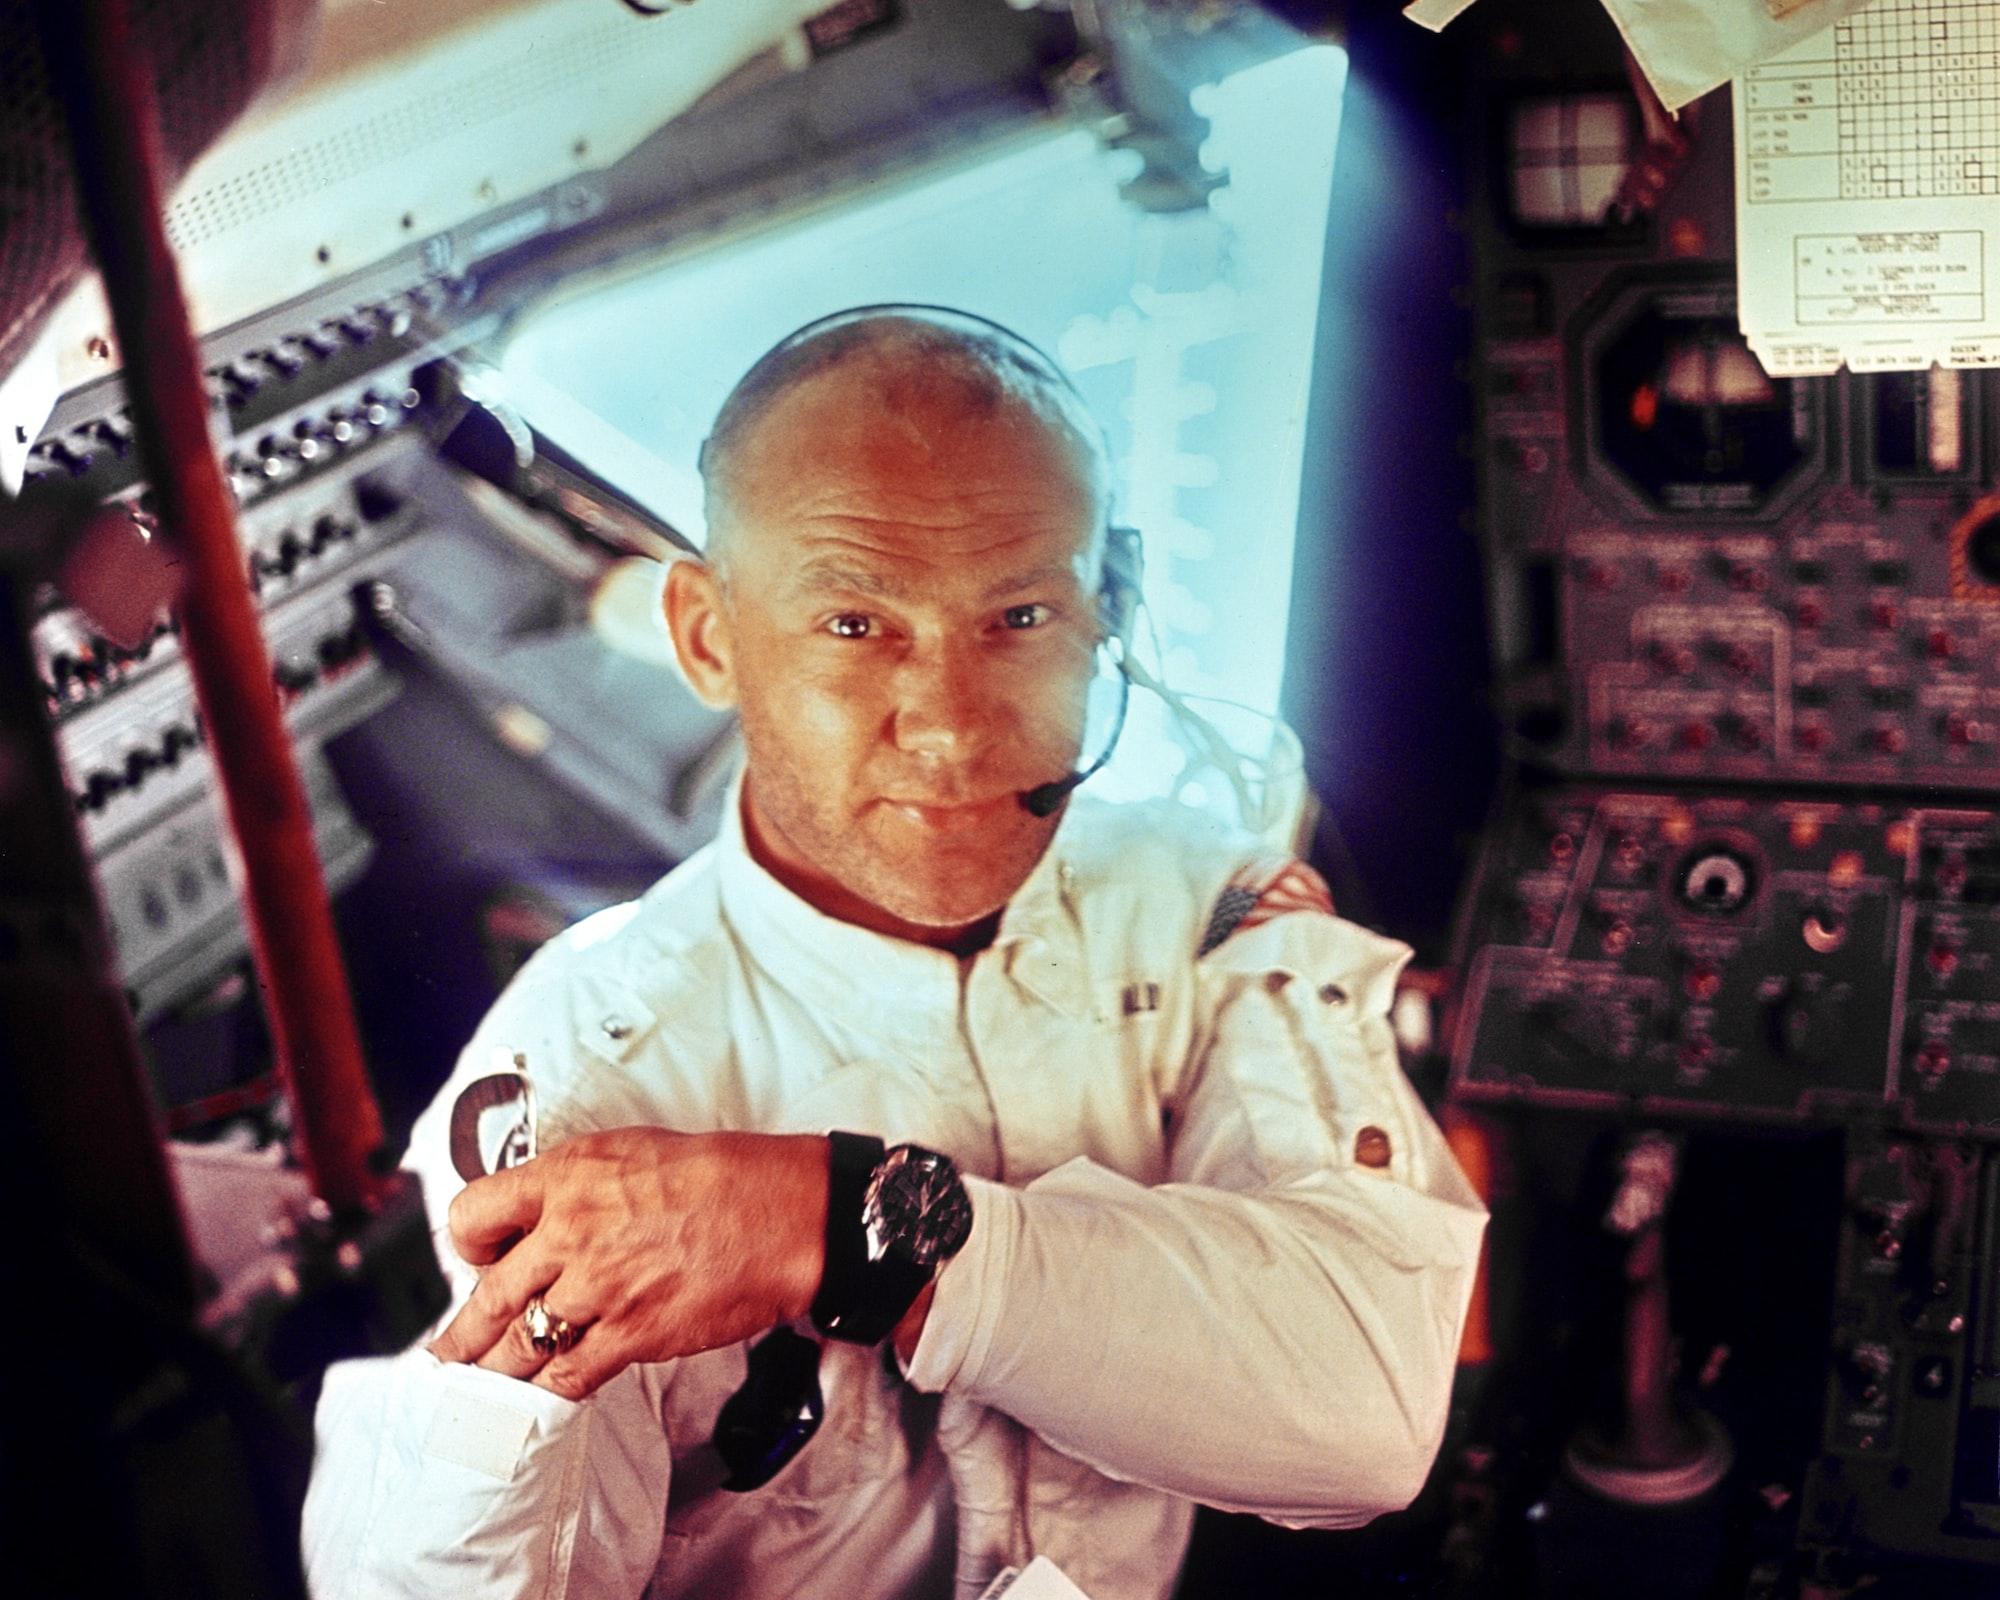 This interior view of the Apollo 11 Lunar Module shows Astronaut Edwin E. Aldrin, Jr., lunar module pilot, during the lunar landing mission